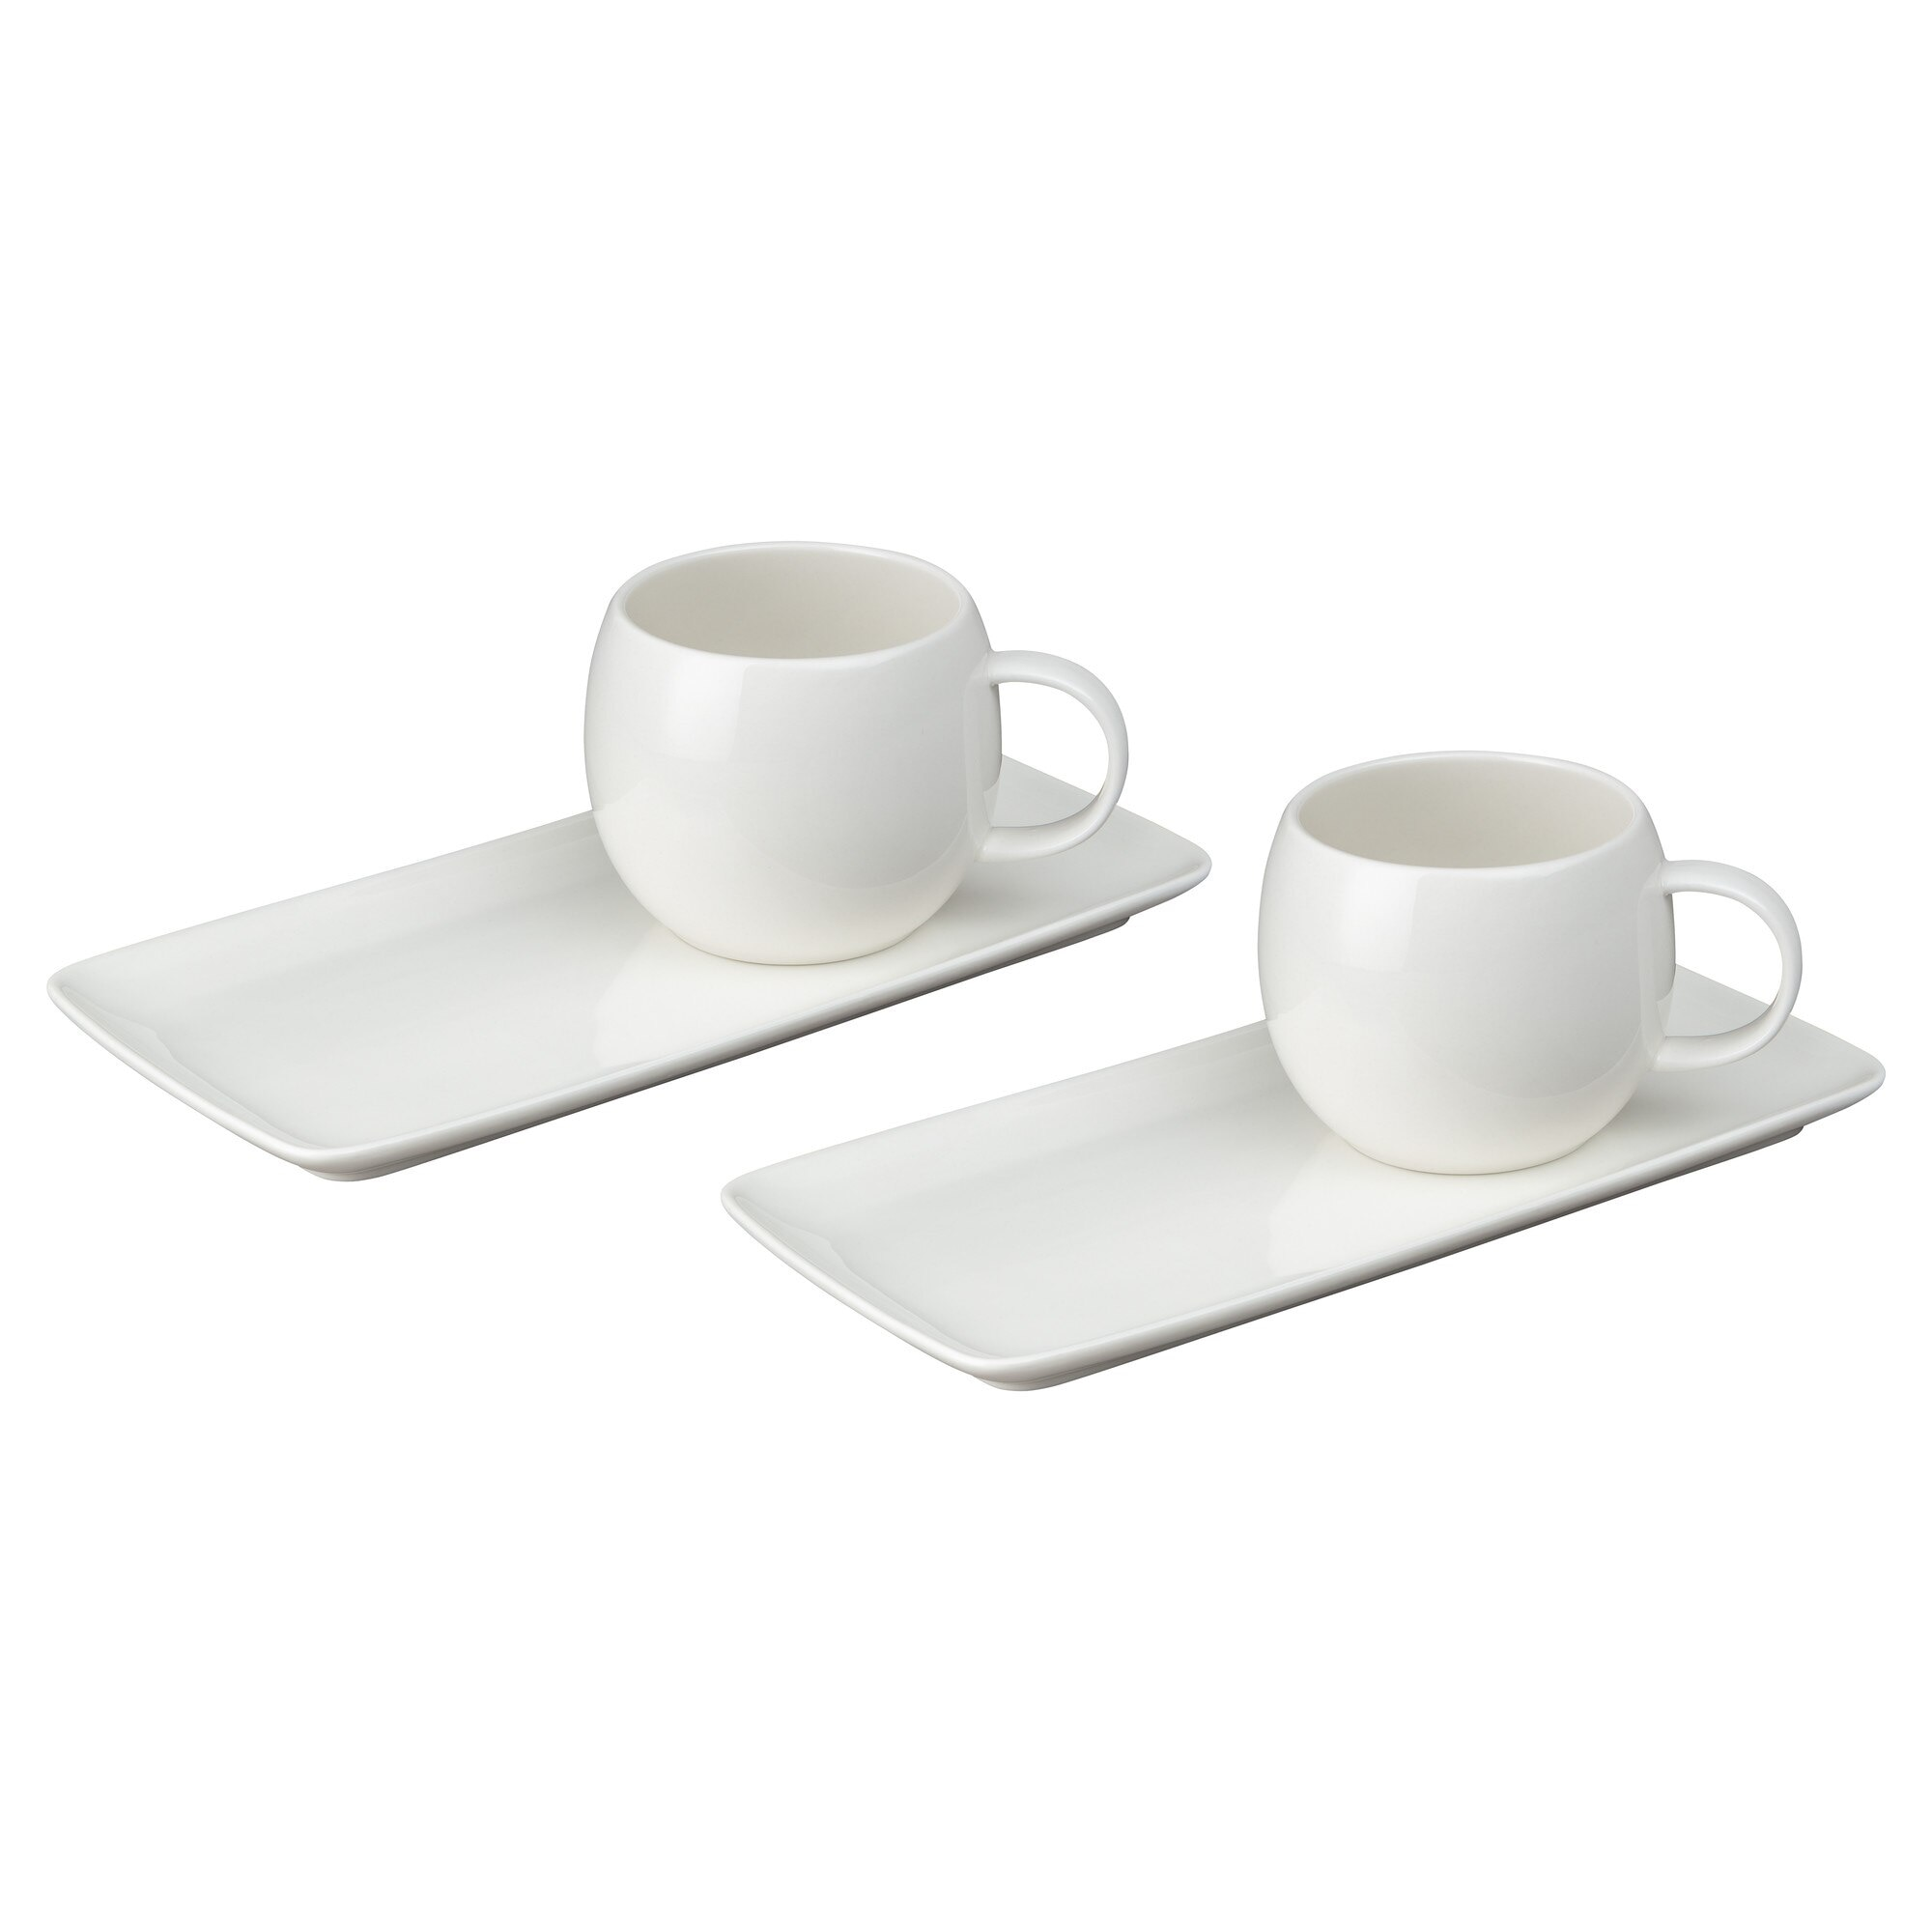 James Martin 2 Piece Mug Plate Set